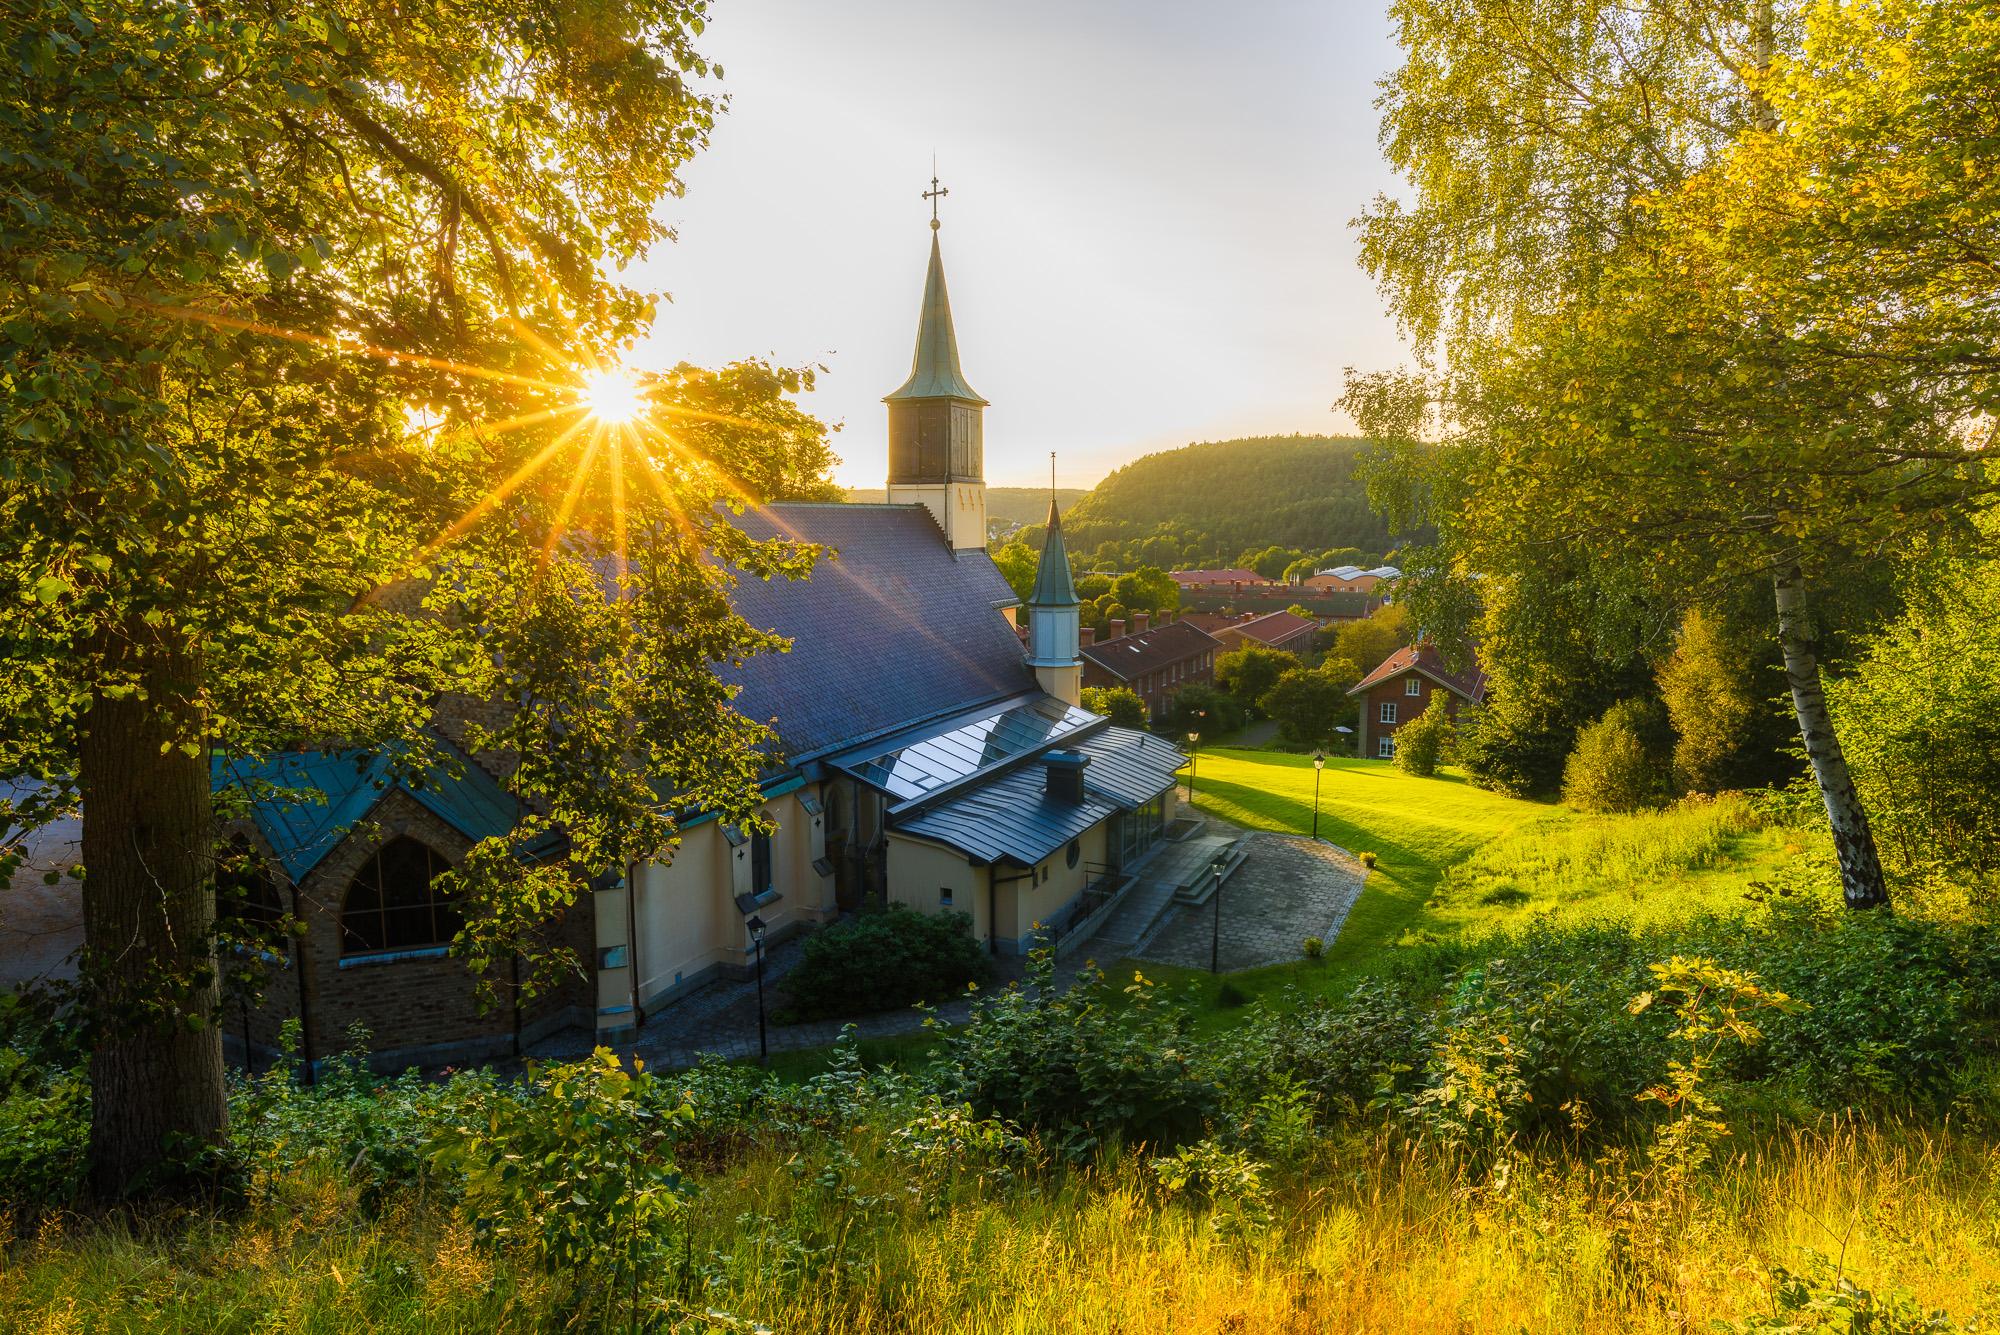 Jonsereds kyrka, Partille kommun. Foto: Mikael Svensson, www.mikaelsvensson.com